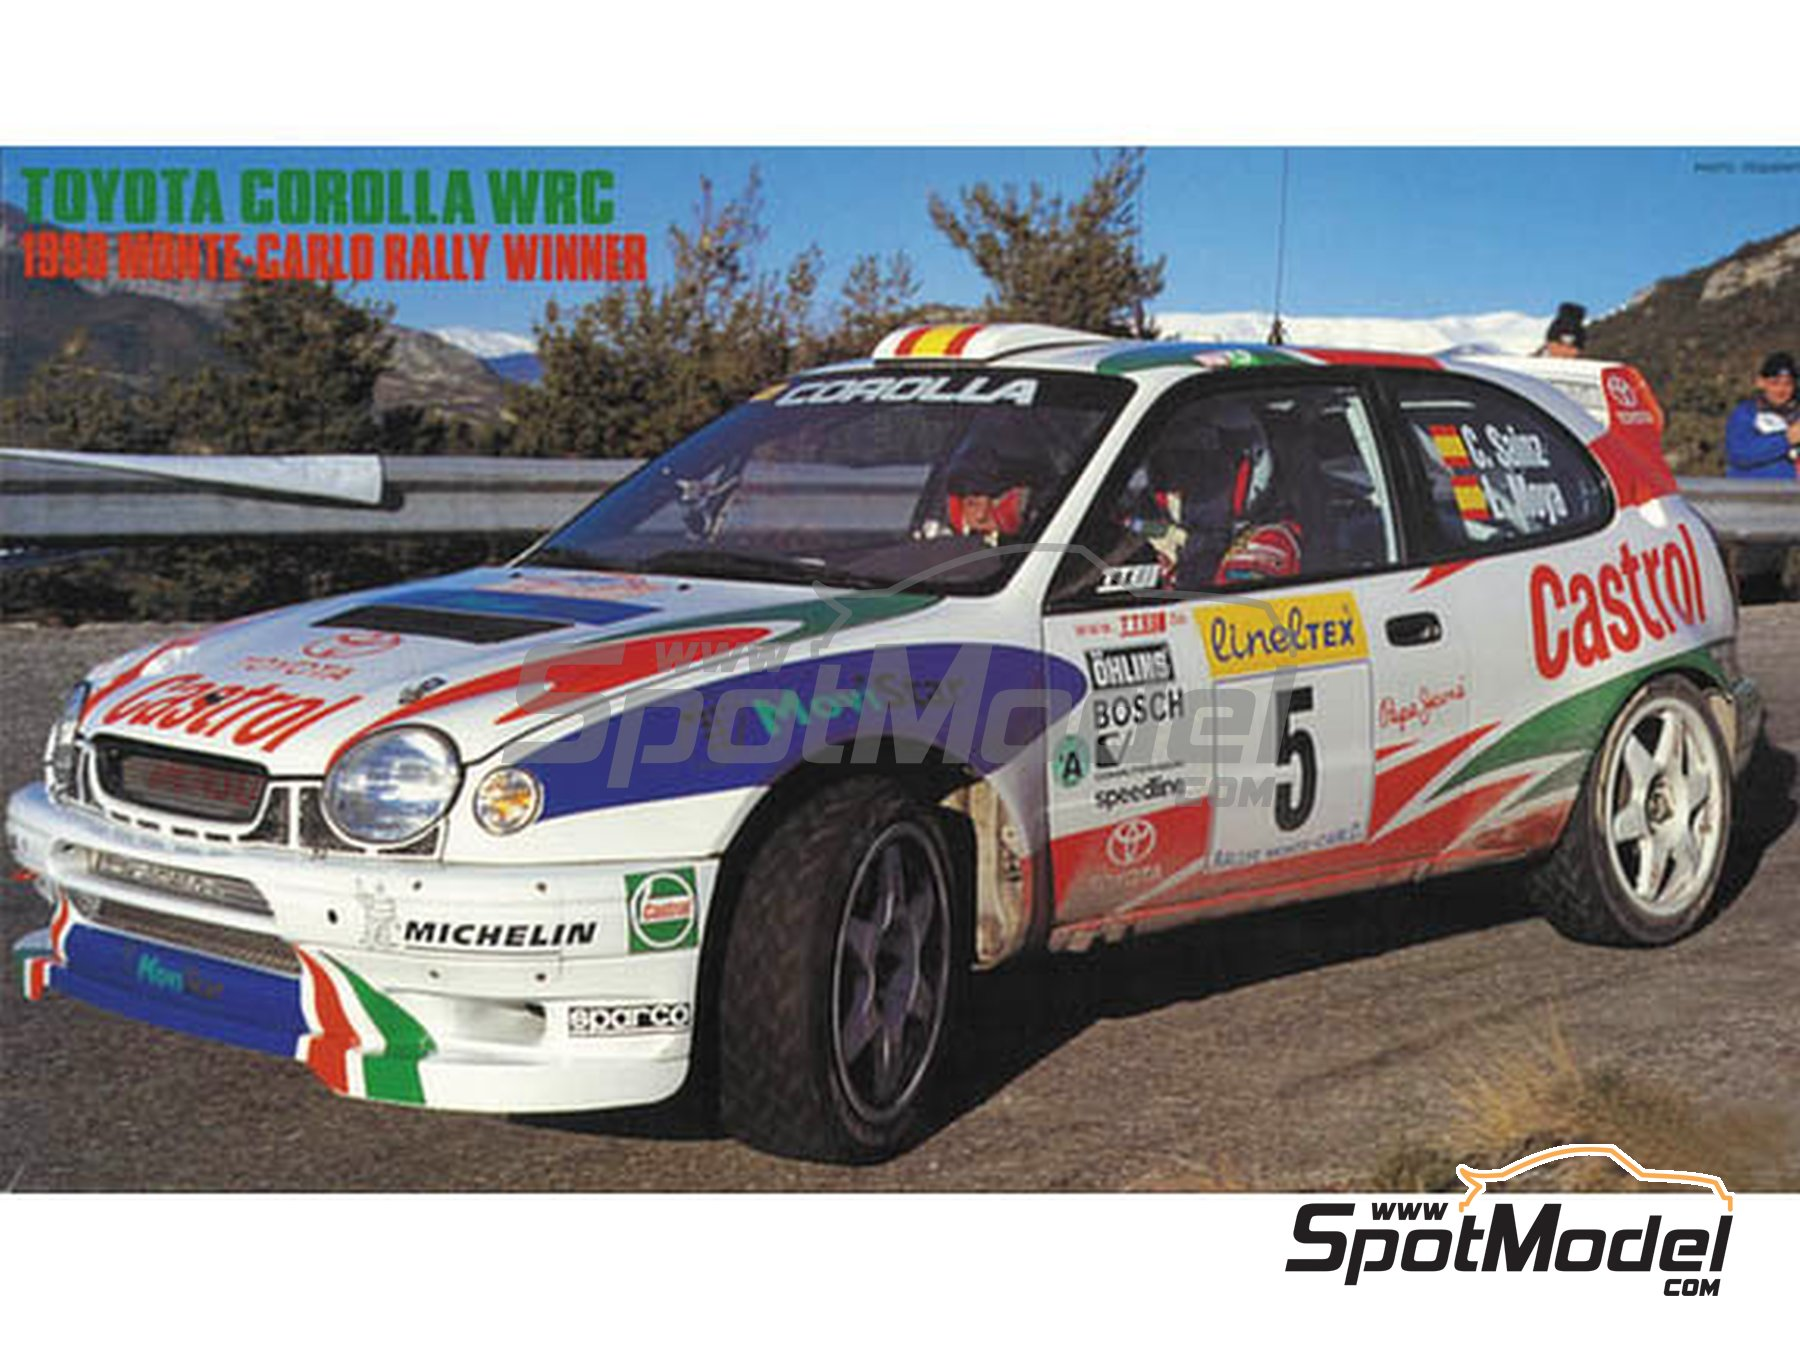 Image 1: Toyota Corolla WRC Castrol Movistar - Rally de Montecarlo 1998 | Maqueta de coche en escala1/24 fabricado por Hasegawa (ref.20266)